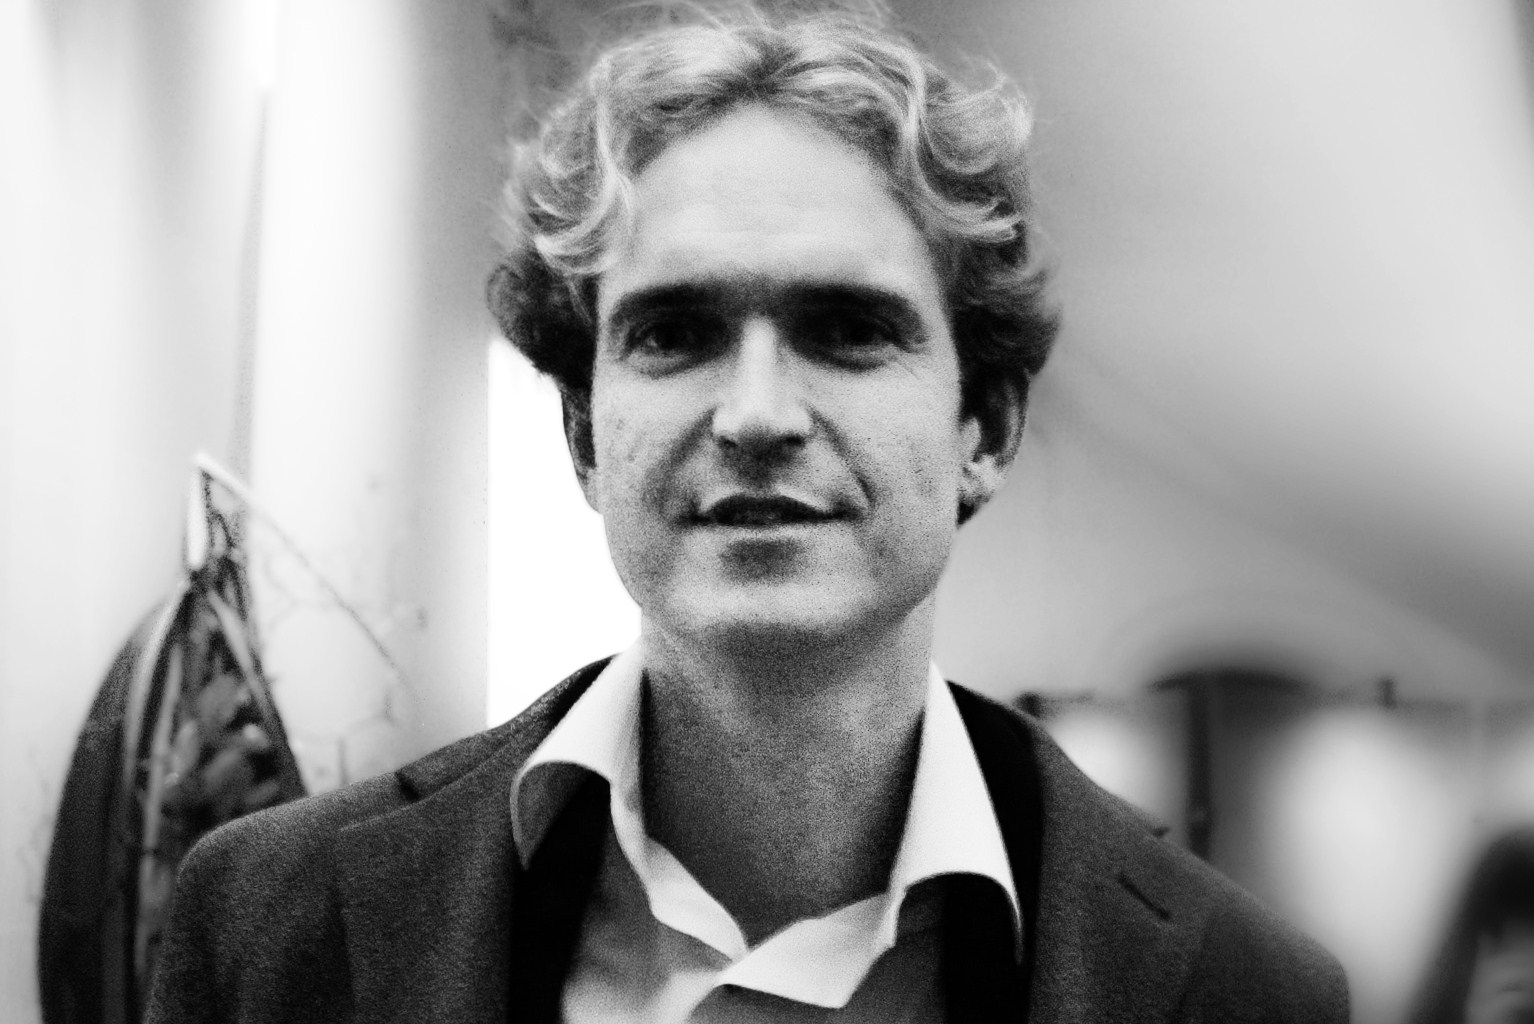 Rencontre avec Fabrice Humbert – Seconde partie